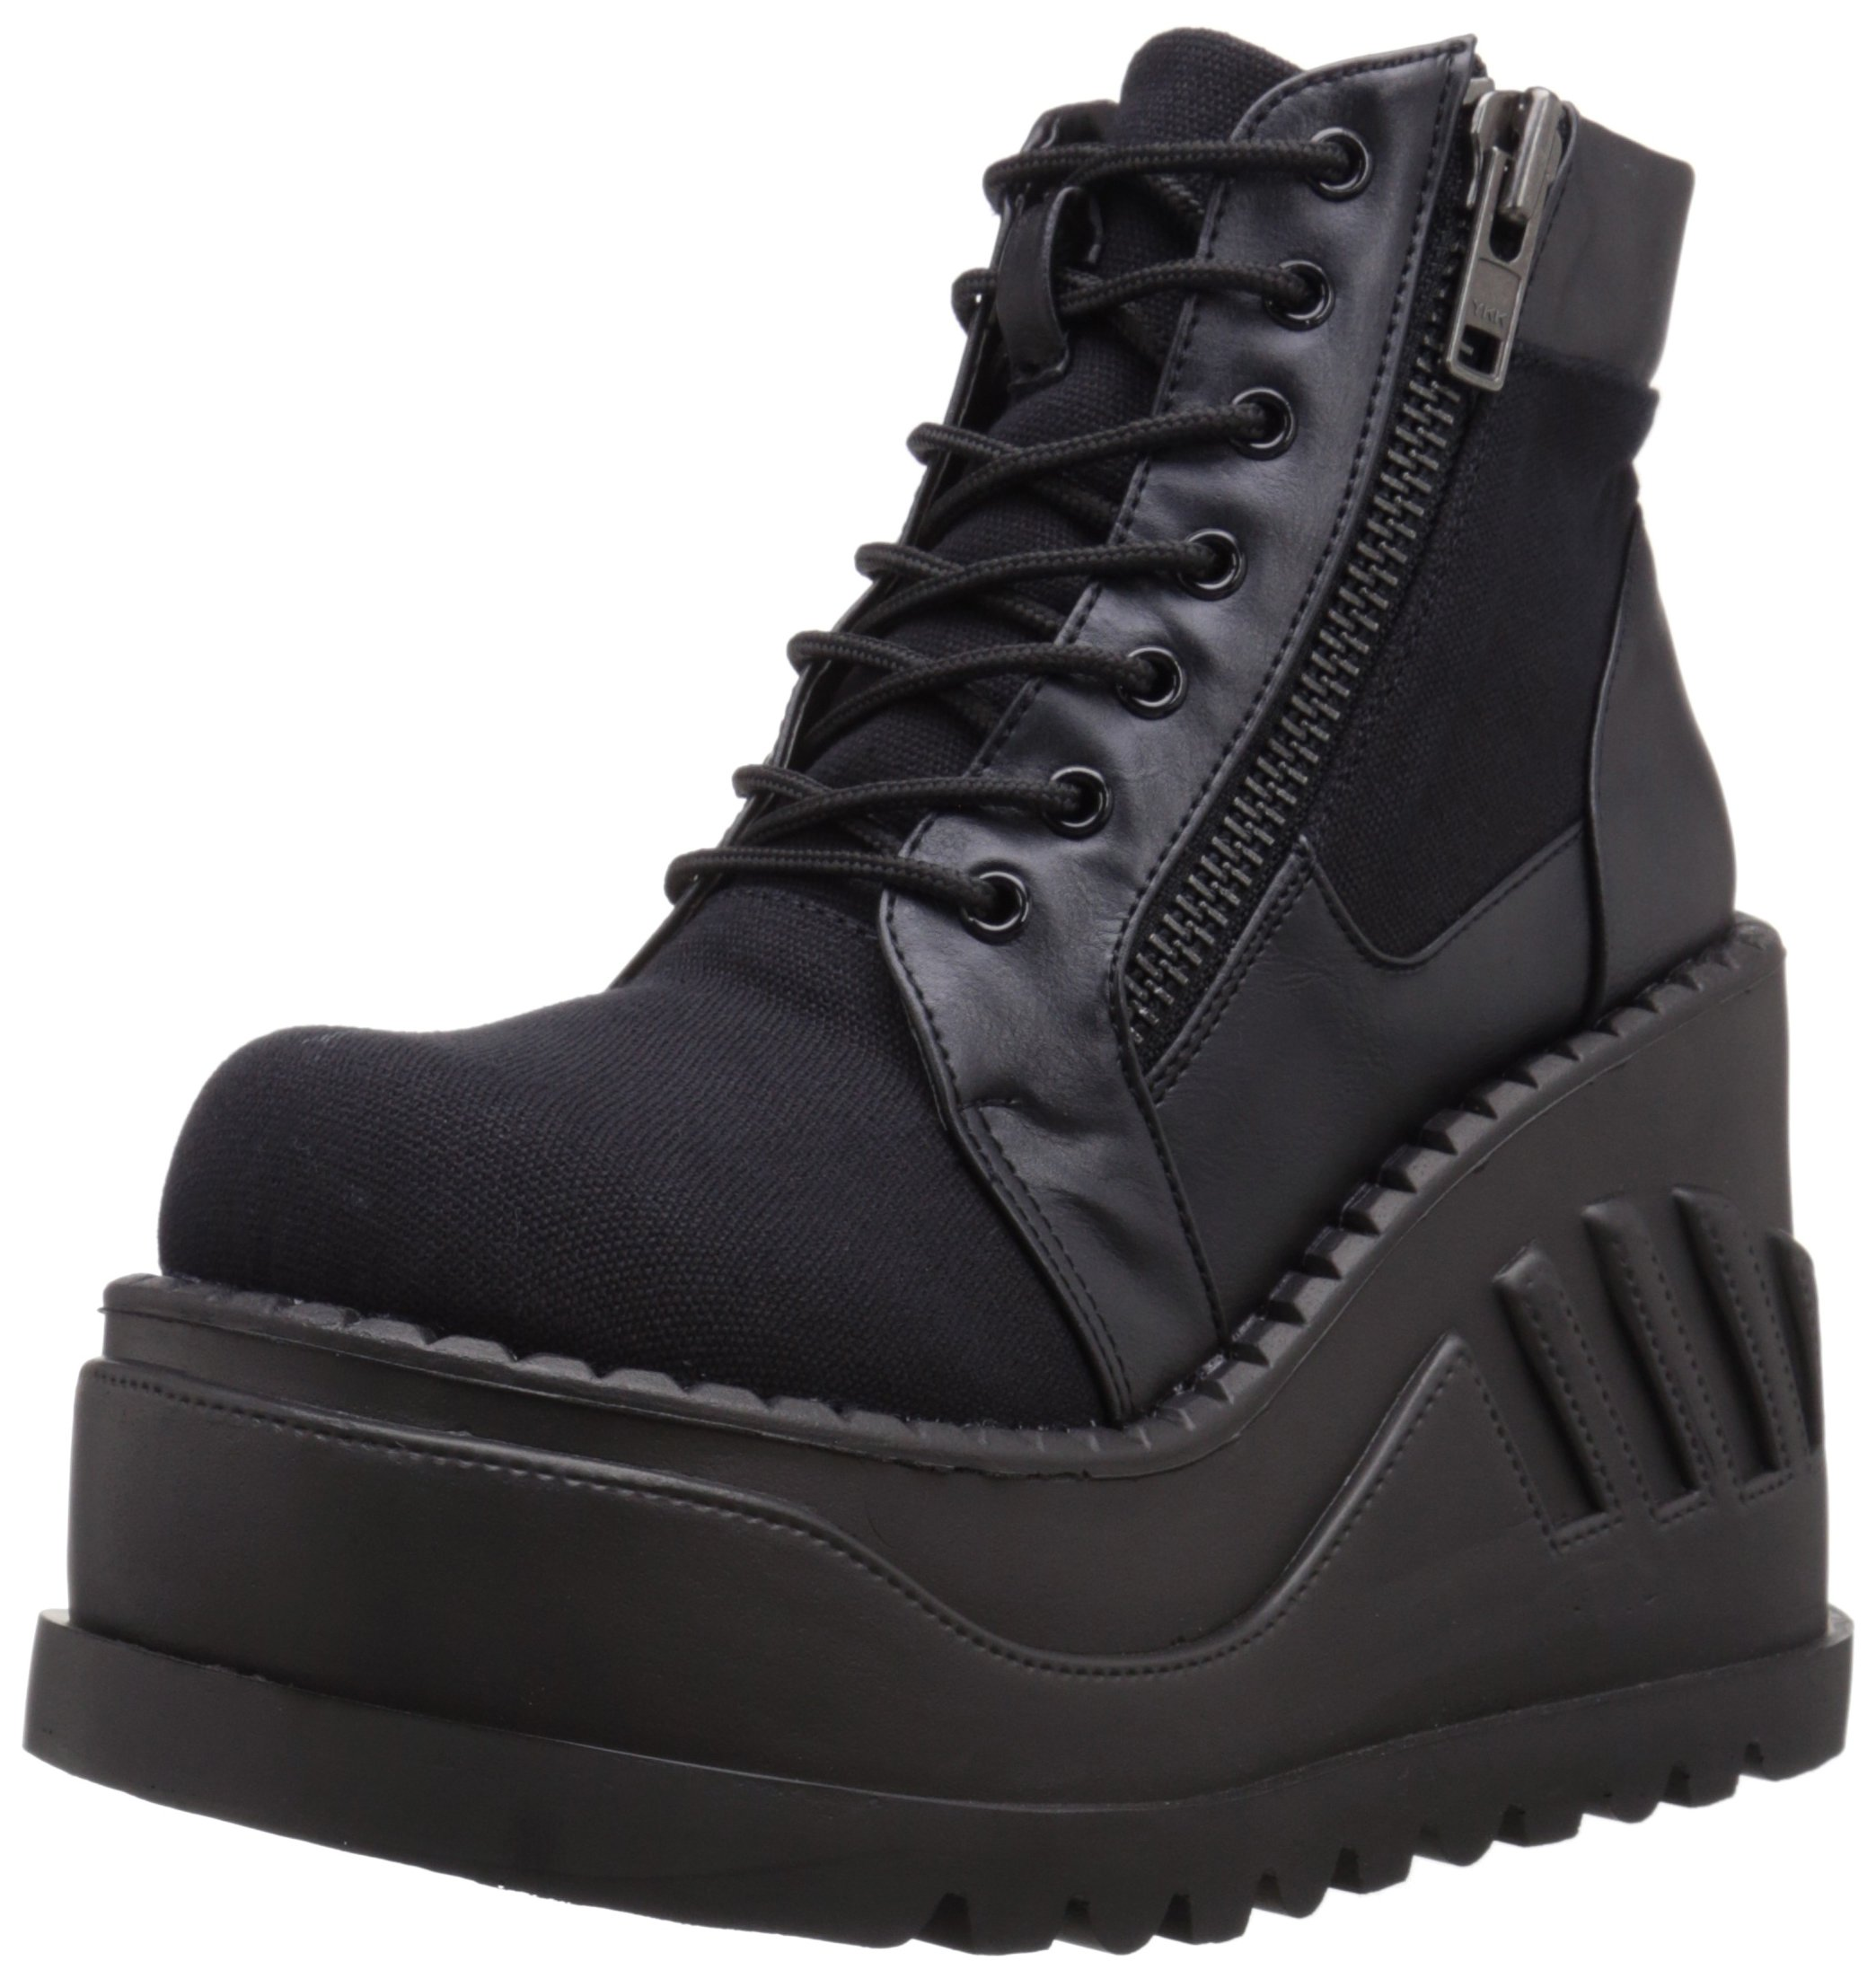 Demonia STO10/BCA-VL Women's Boot, Black Canvas Vegan Leather, 10 M US